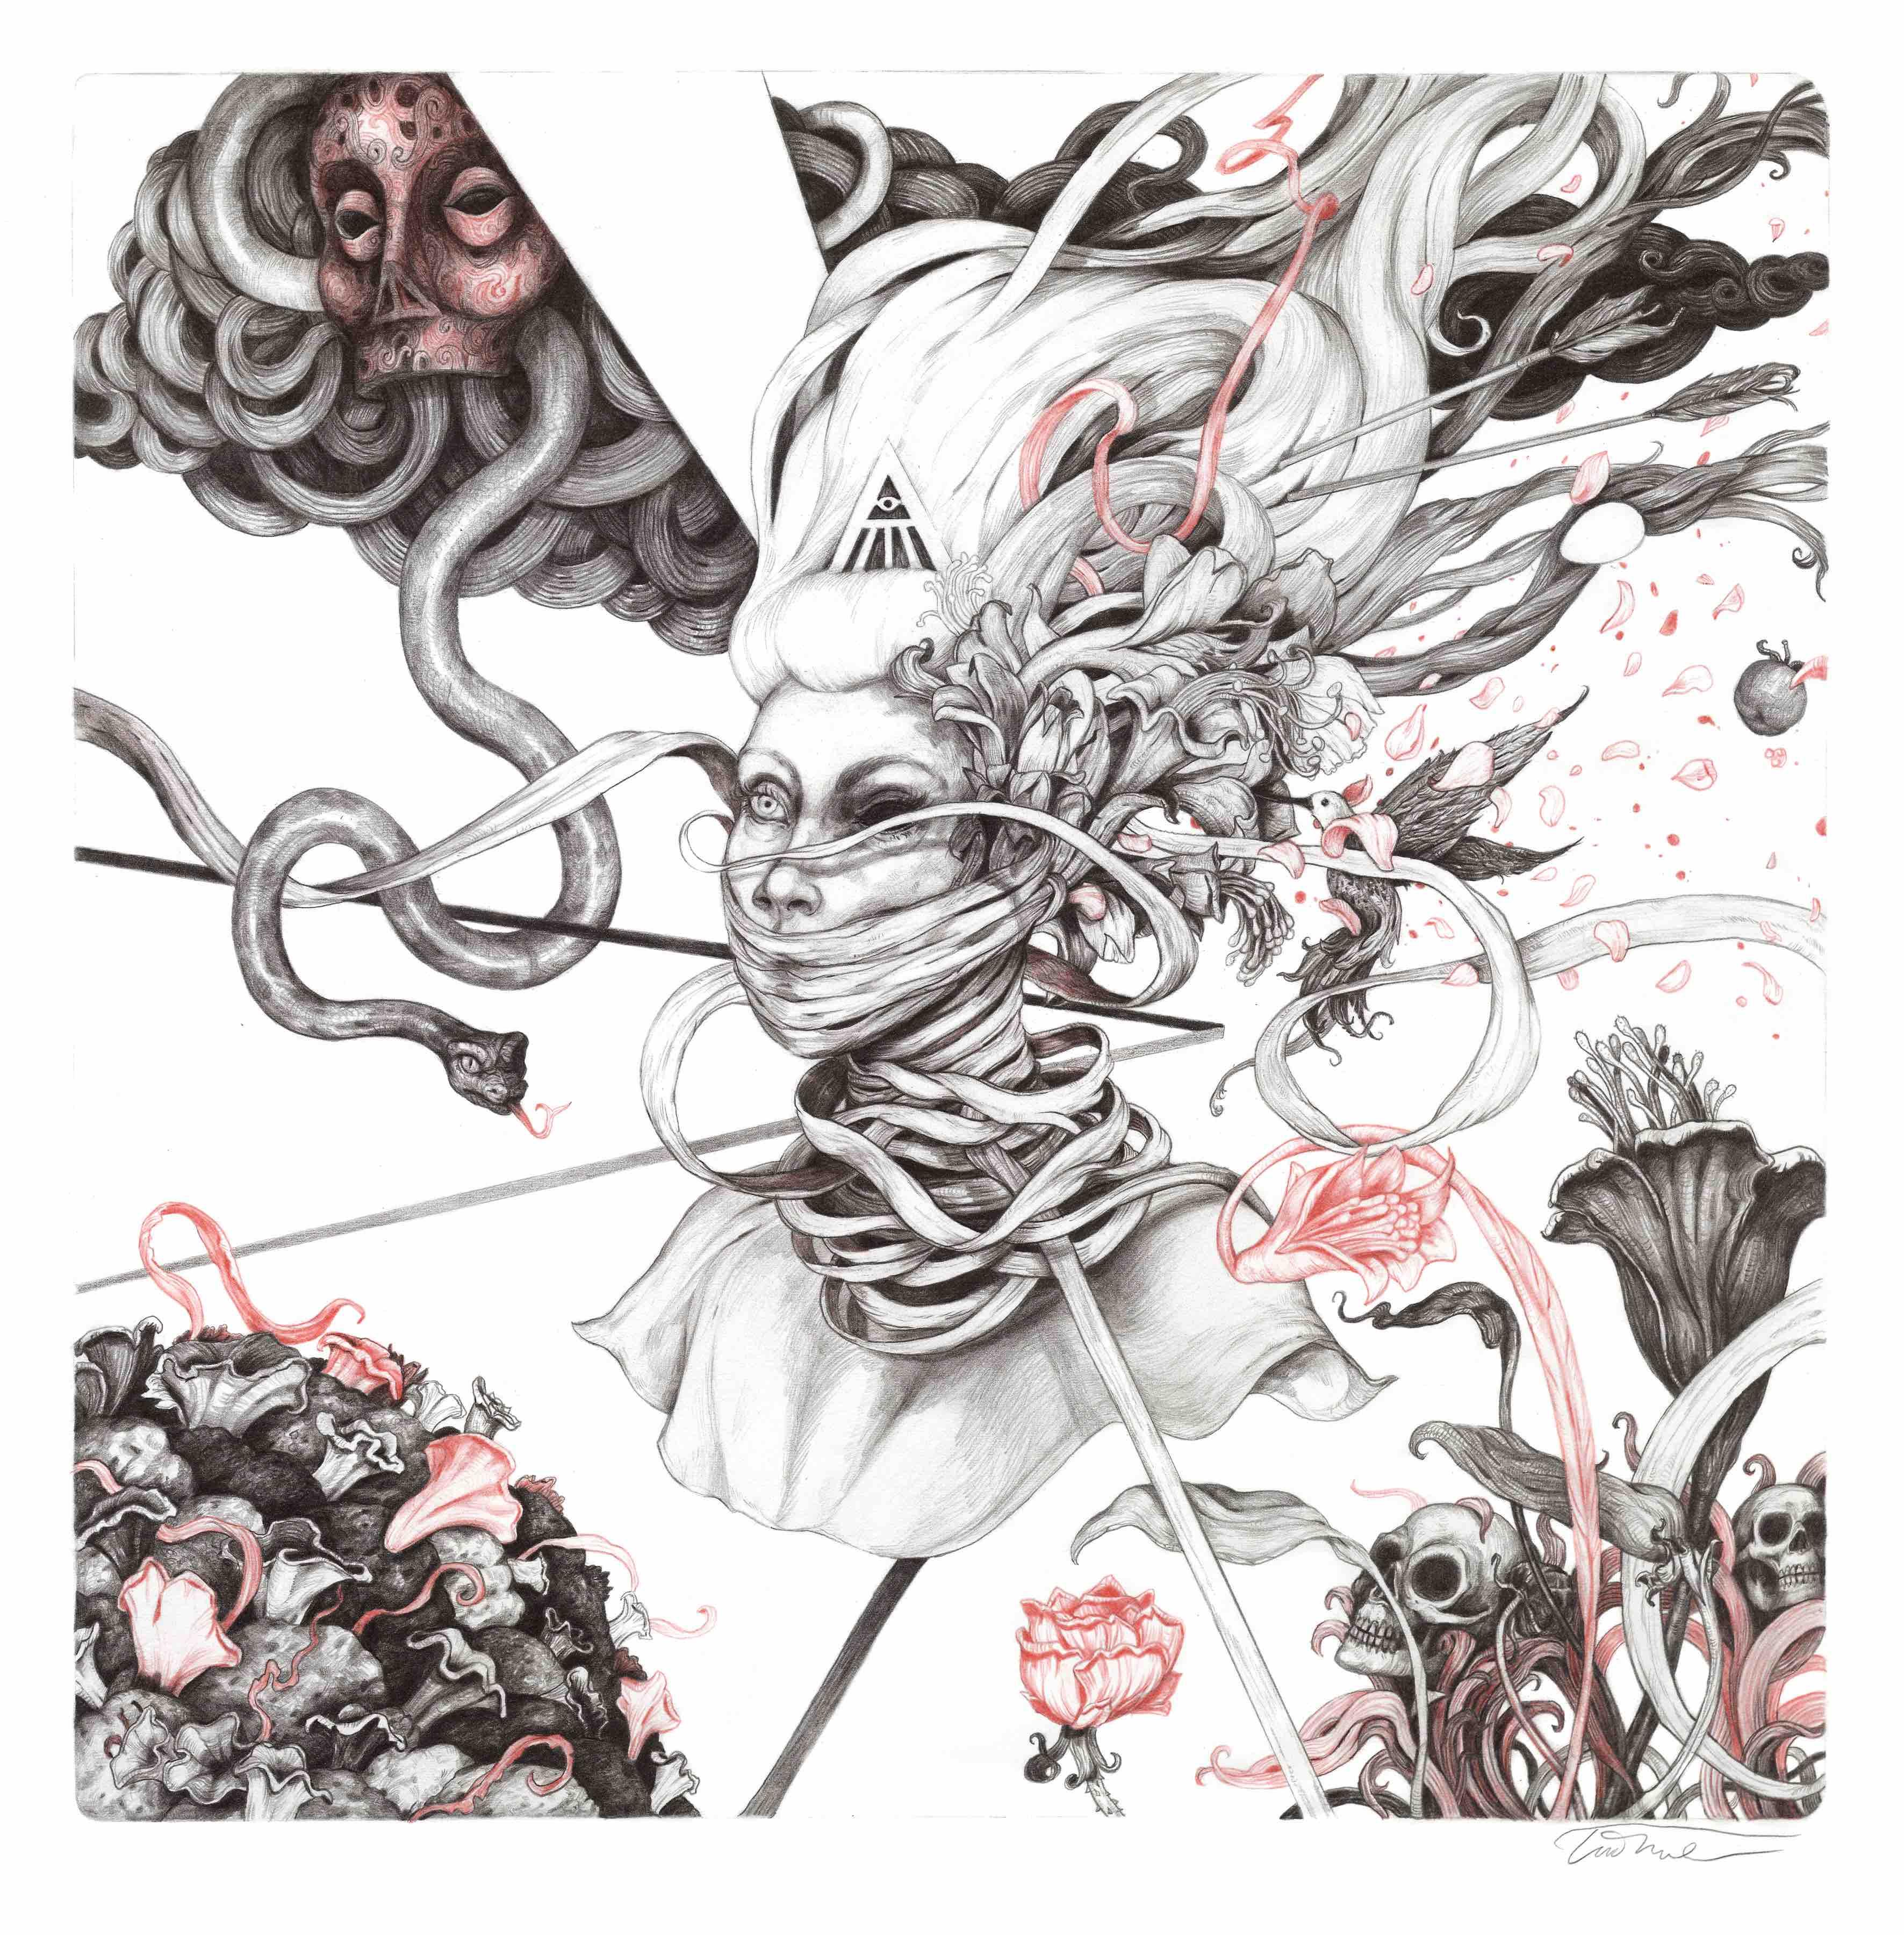 3543x3600 Illustrator Tim Lane On Philosophy, Death